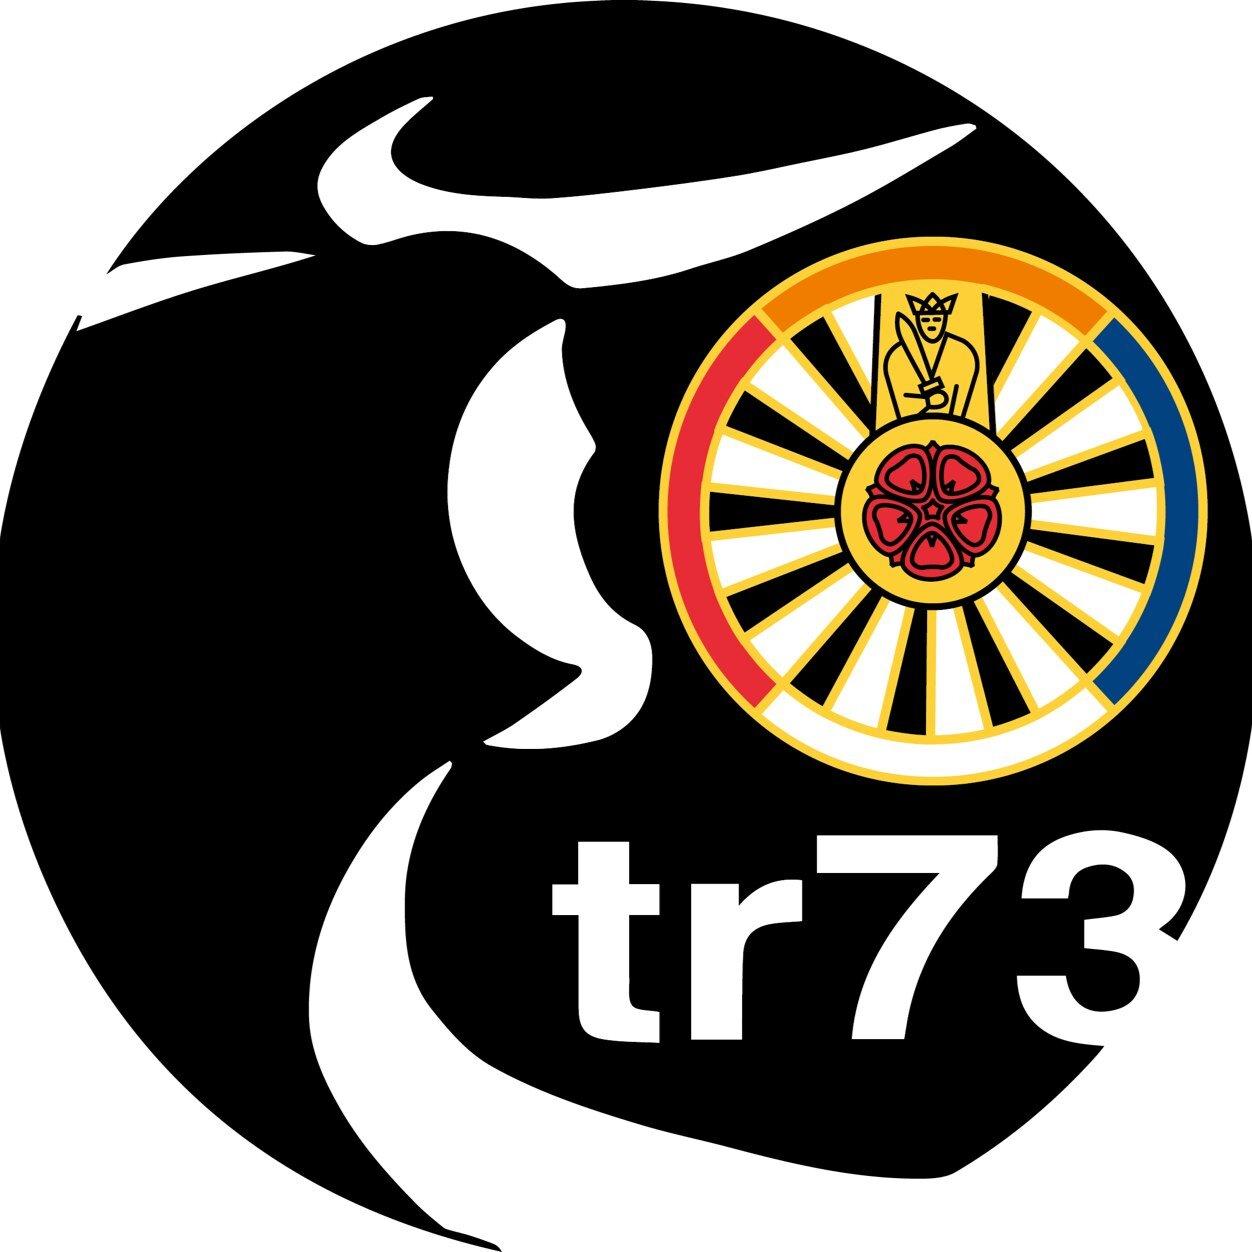 Ronde Tafel Oss.Tafelronde 73 Oss Tafelronde73 Twitter